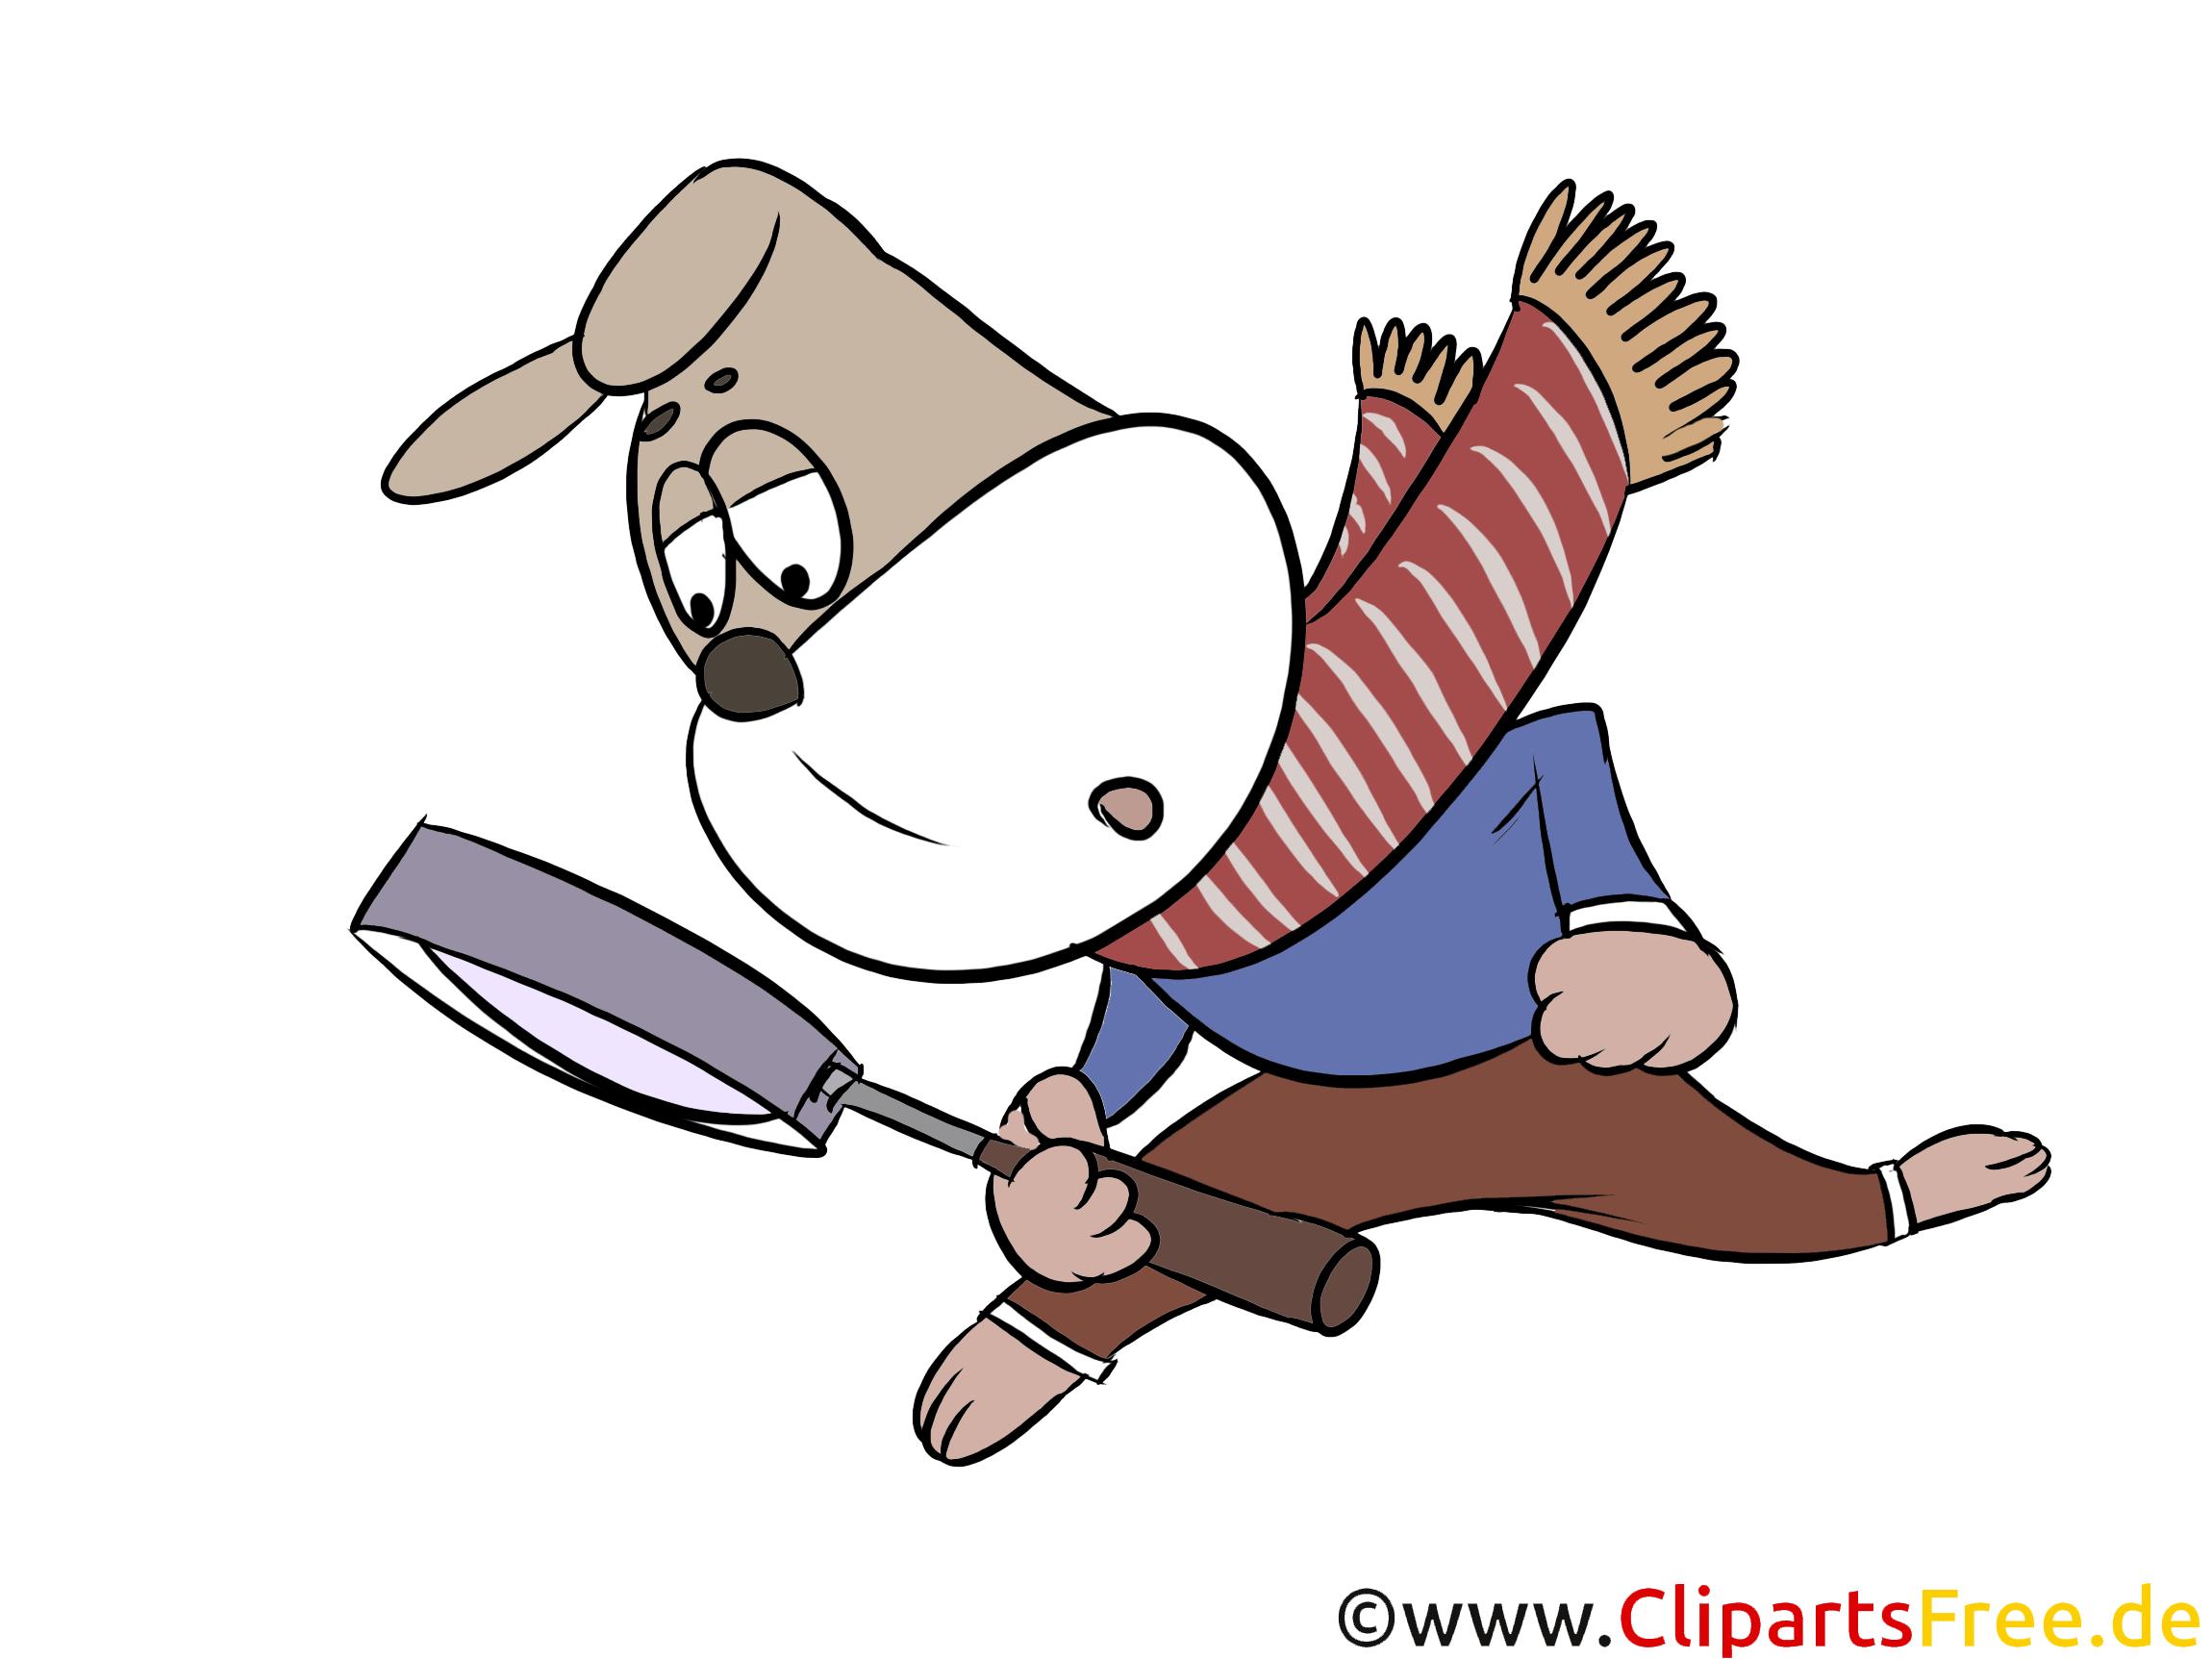 Clipart Hund mit Lupe